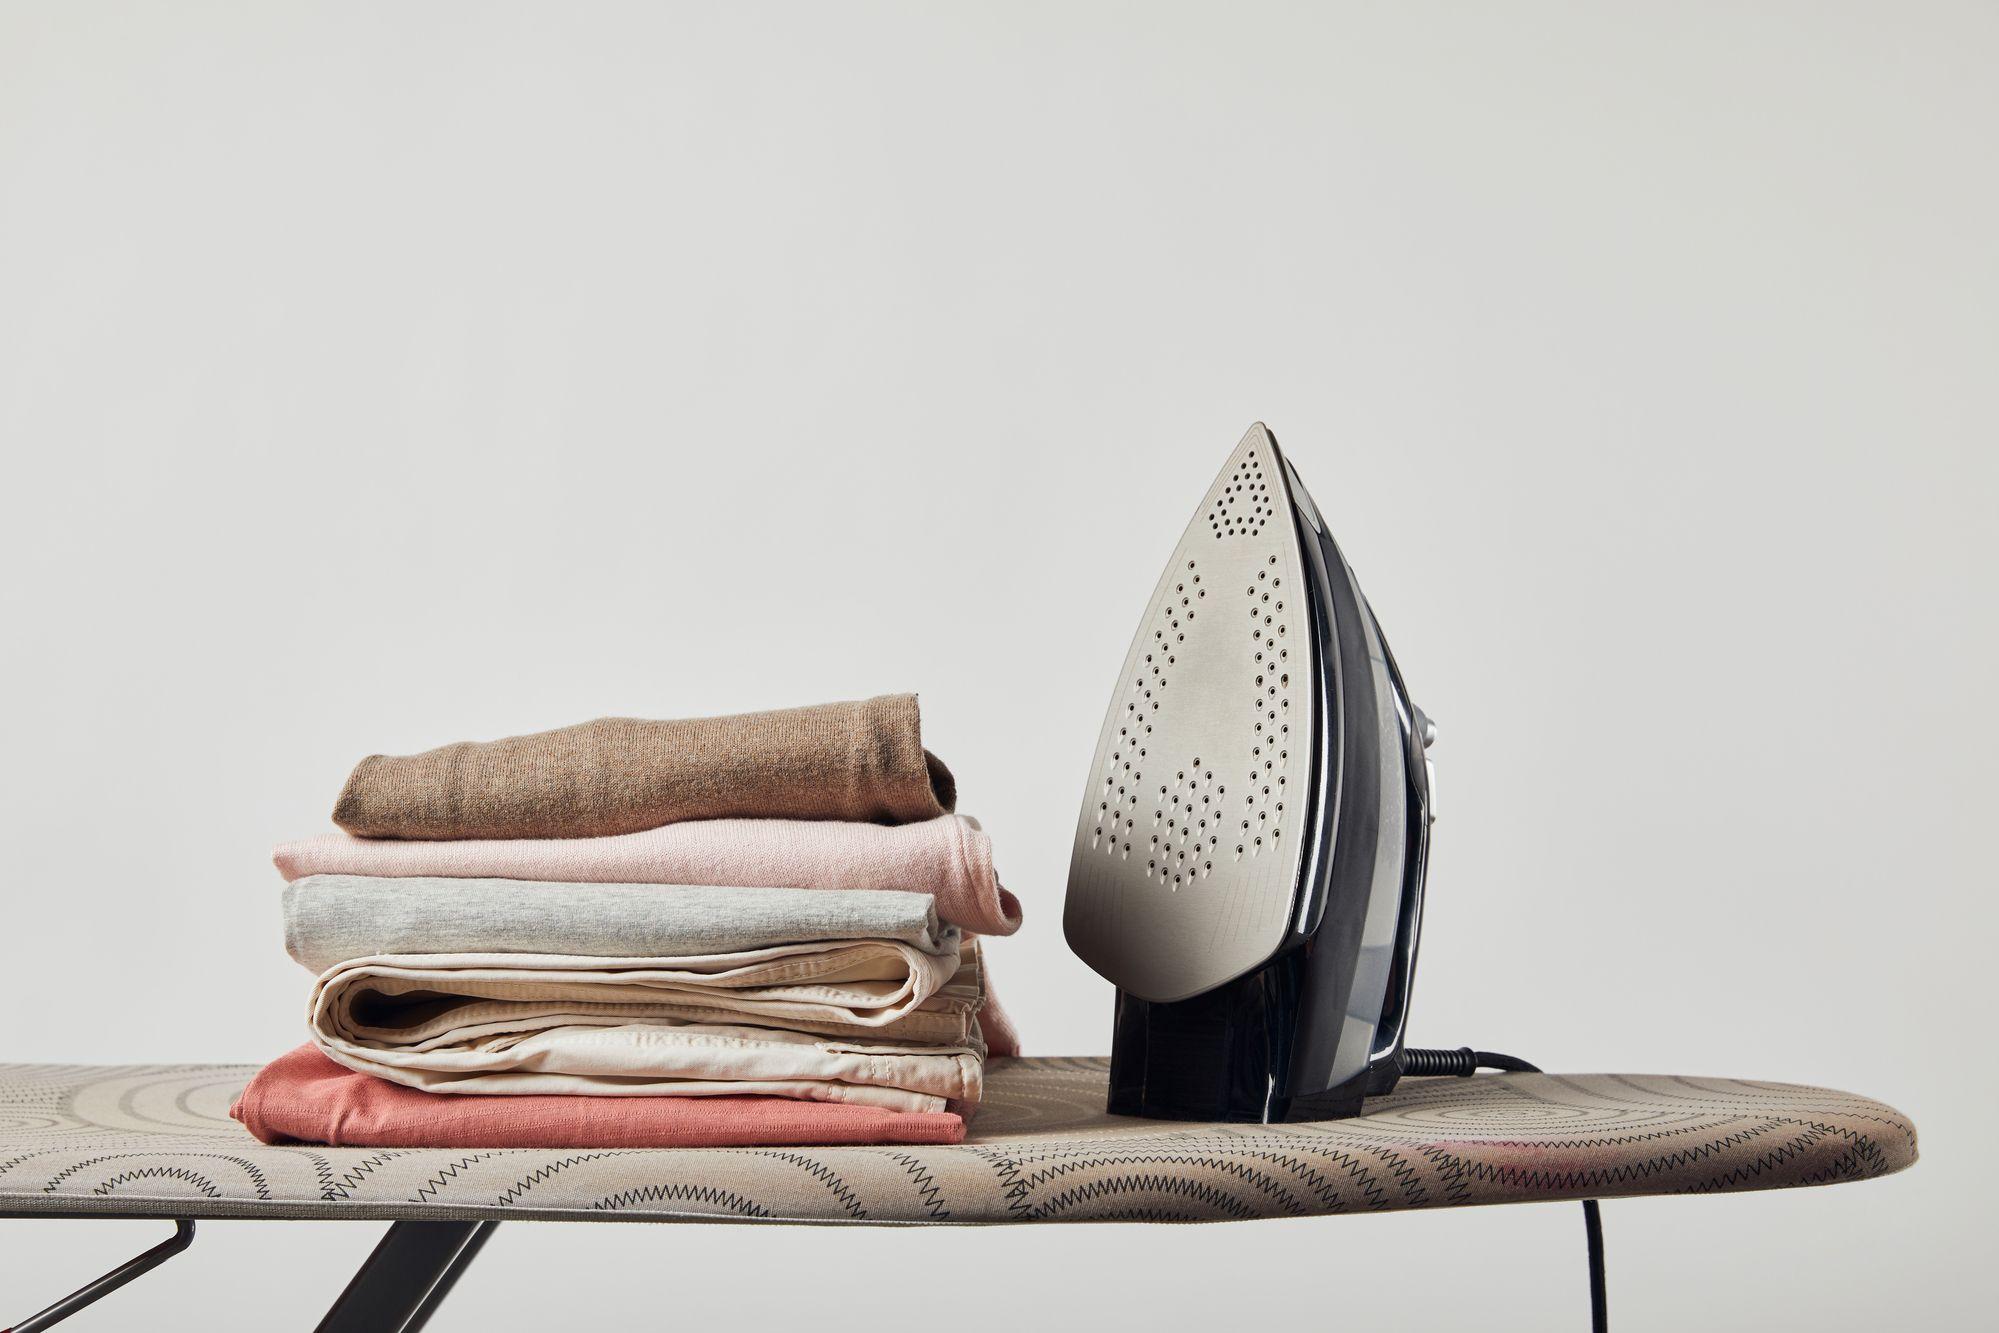 Jangan Asal Cuci, Ini Tips Merawat Underwear yang Benar